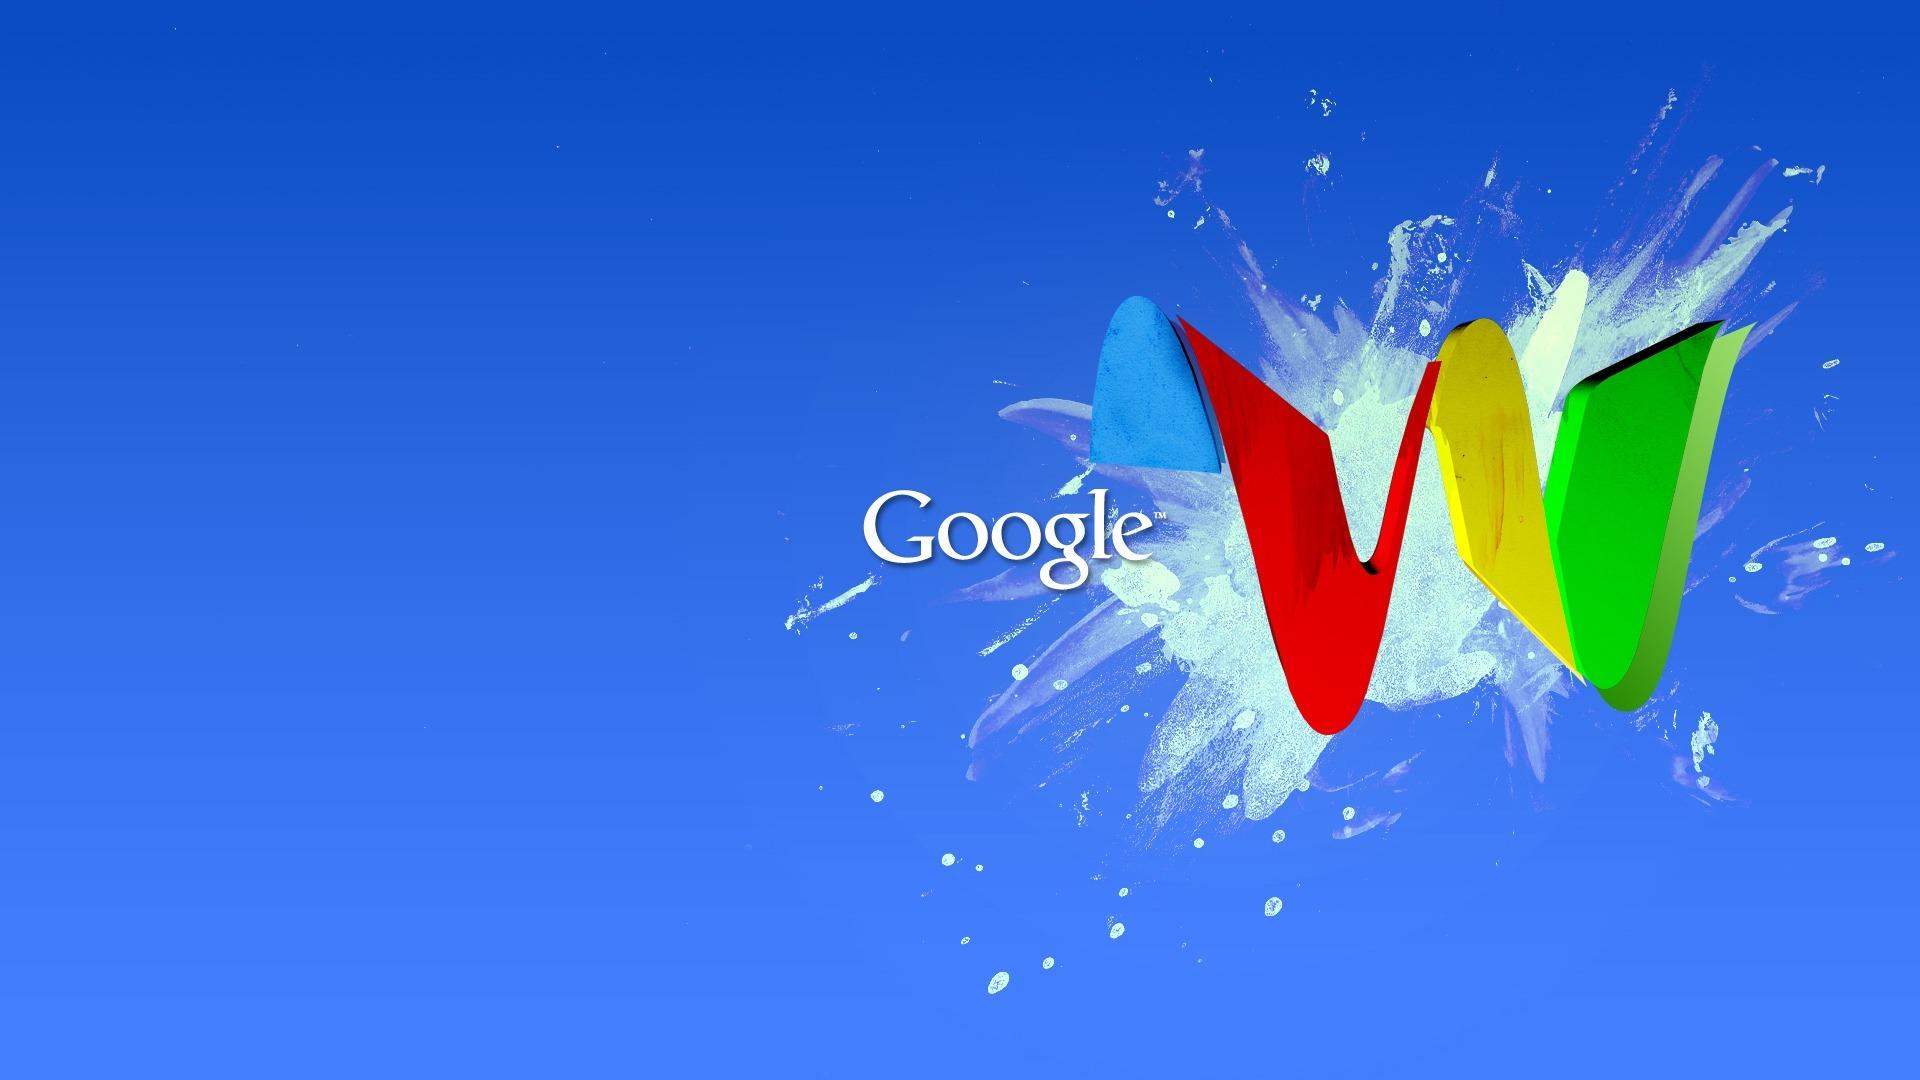 Google Wallpapers Hd  Pixelstalknet